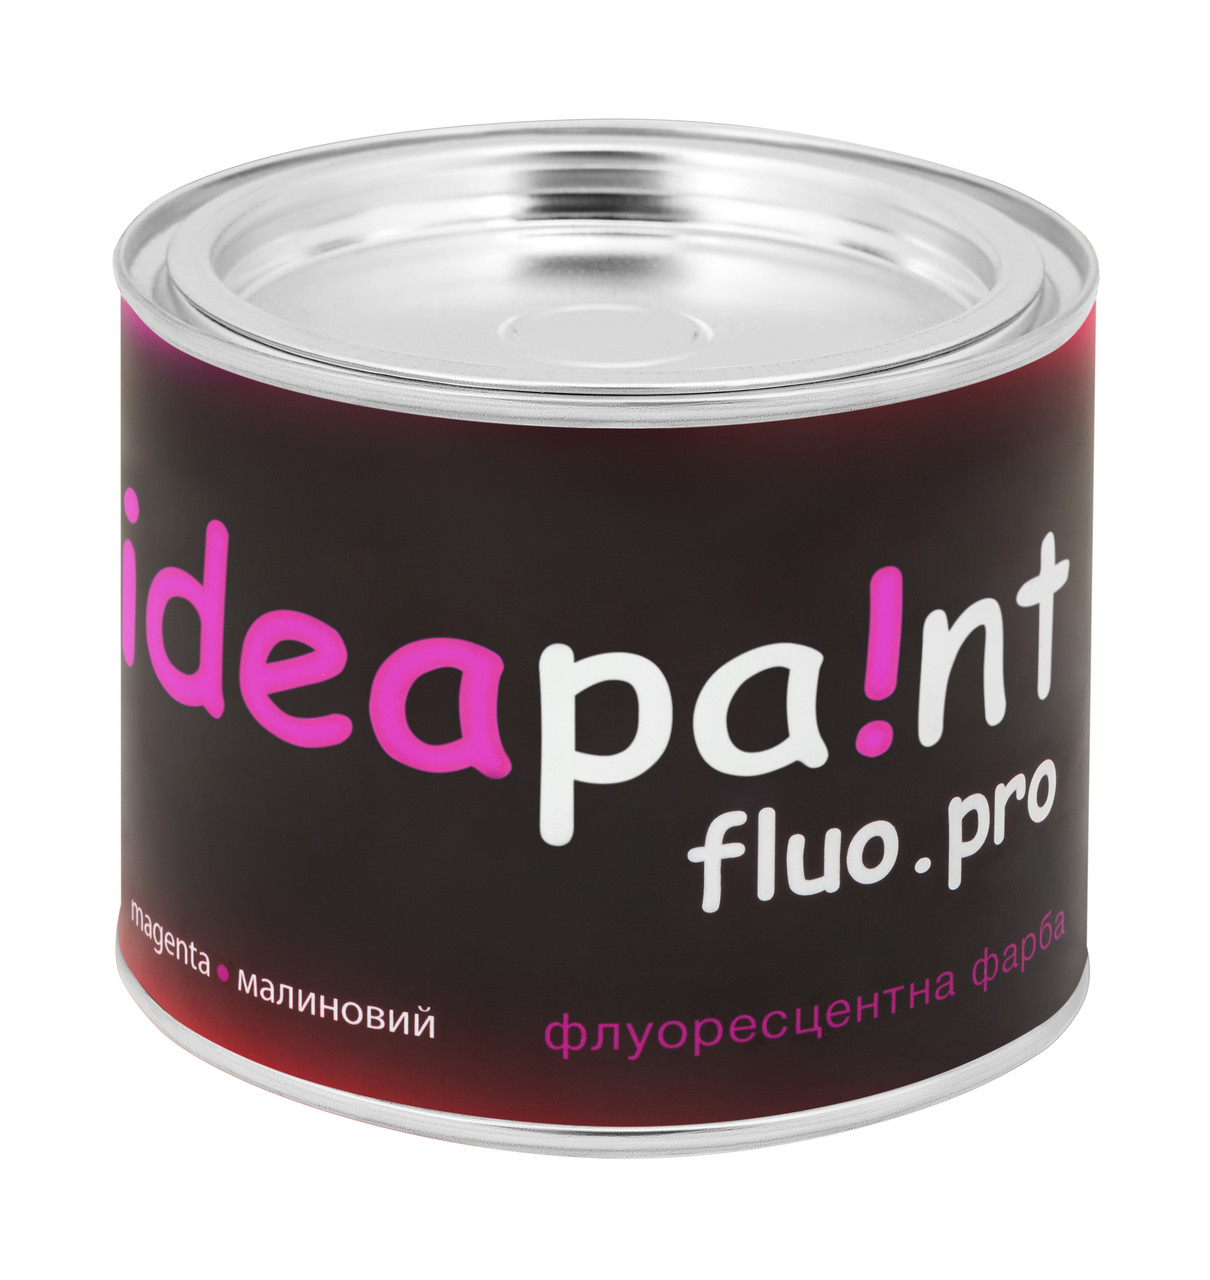 Флуоресцентная краска малиновая  ideapaint  0,5 л.